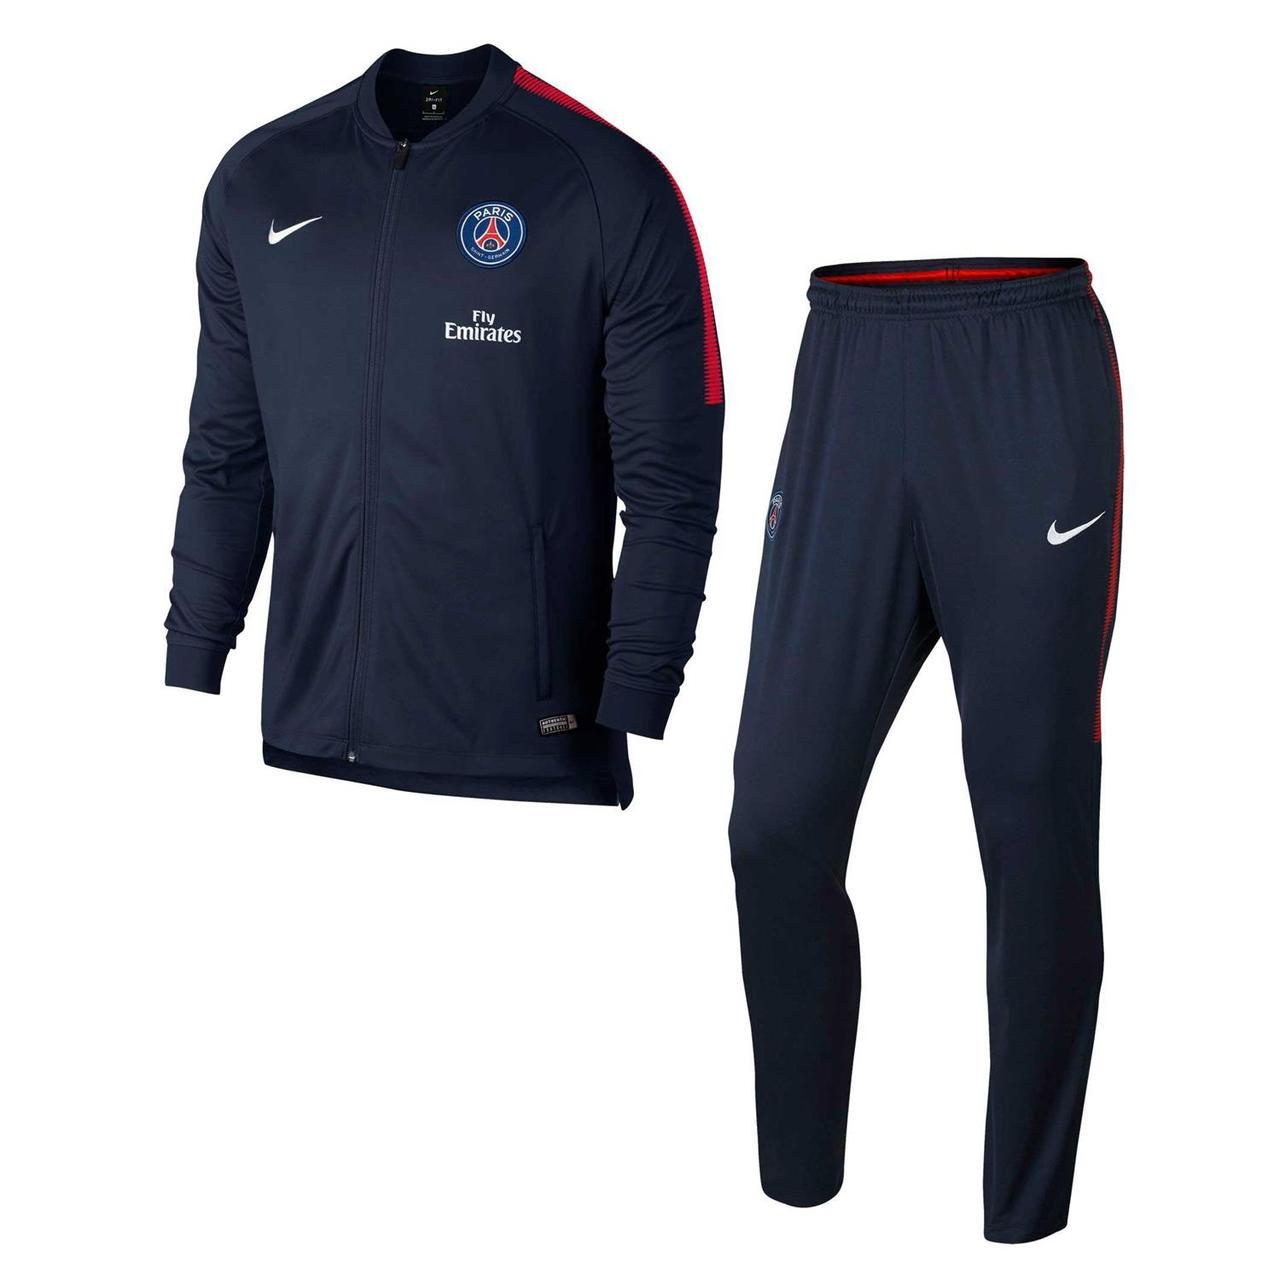 8fbb154a2185 Спортивный костюм мужской Nike Paris Saint Germain Trainingspak